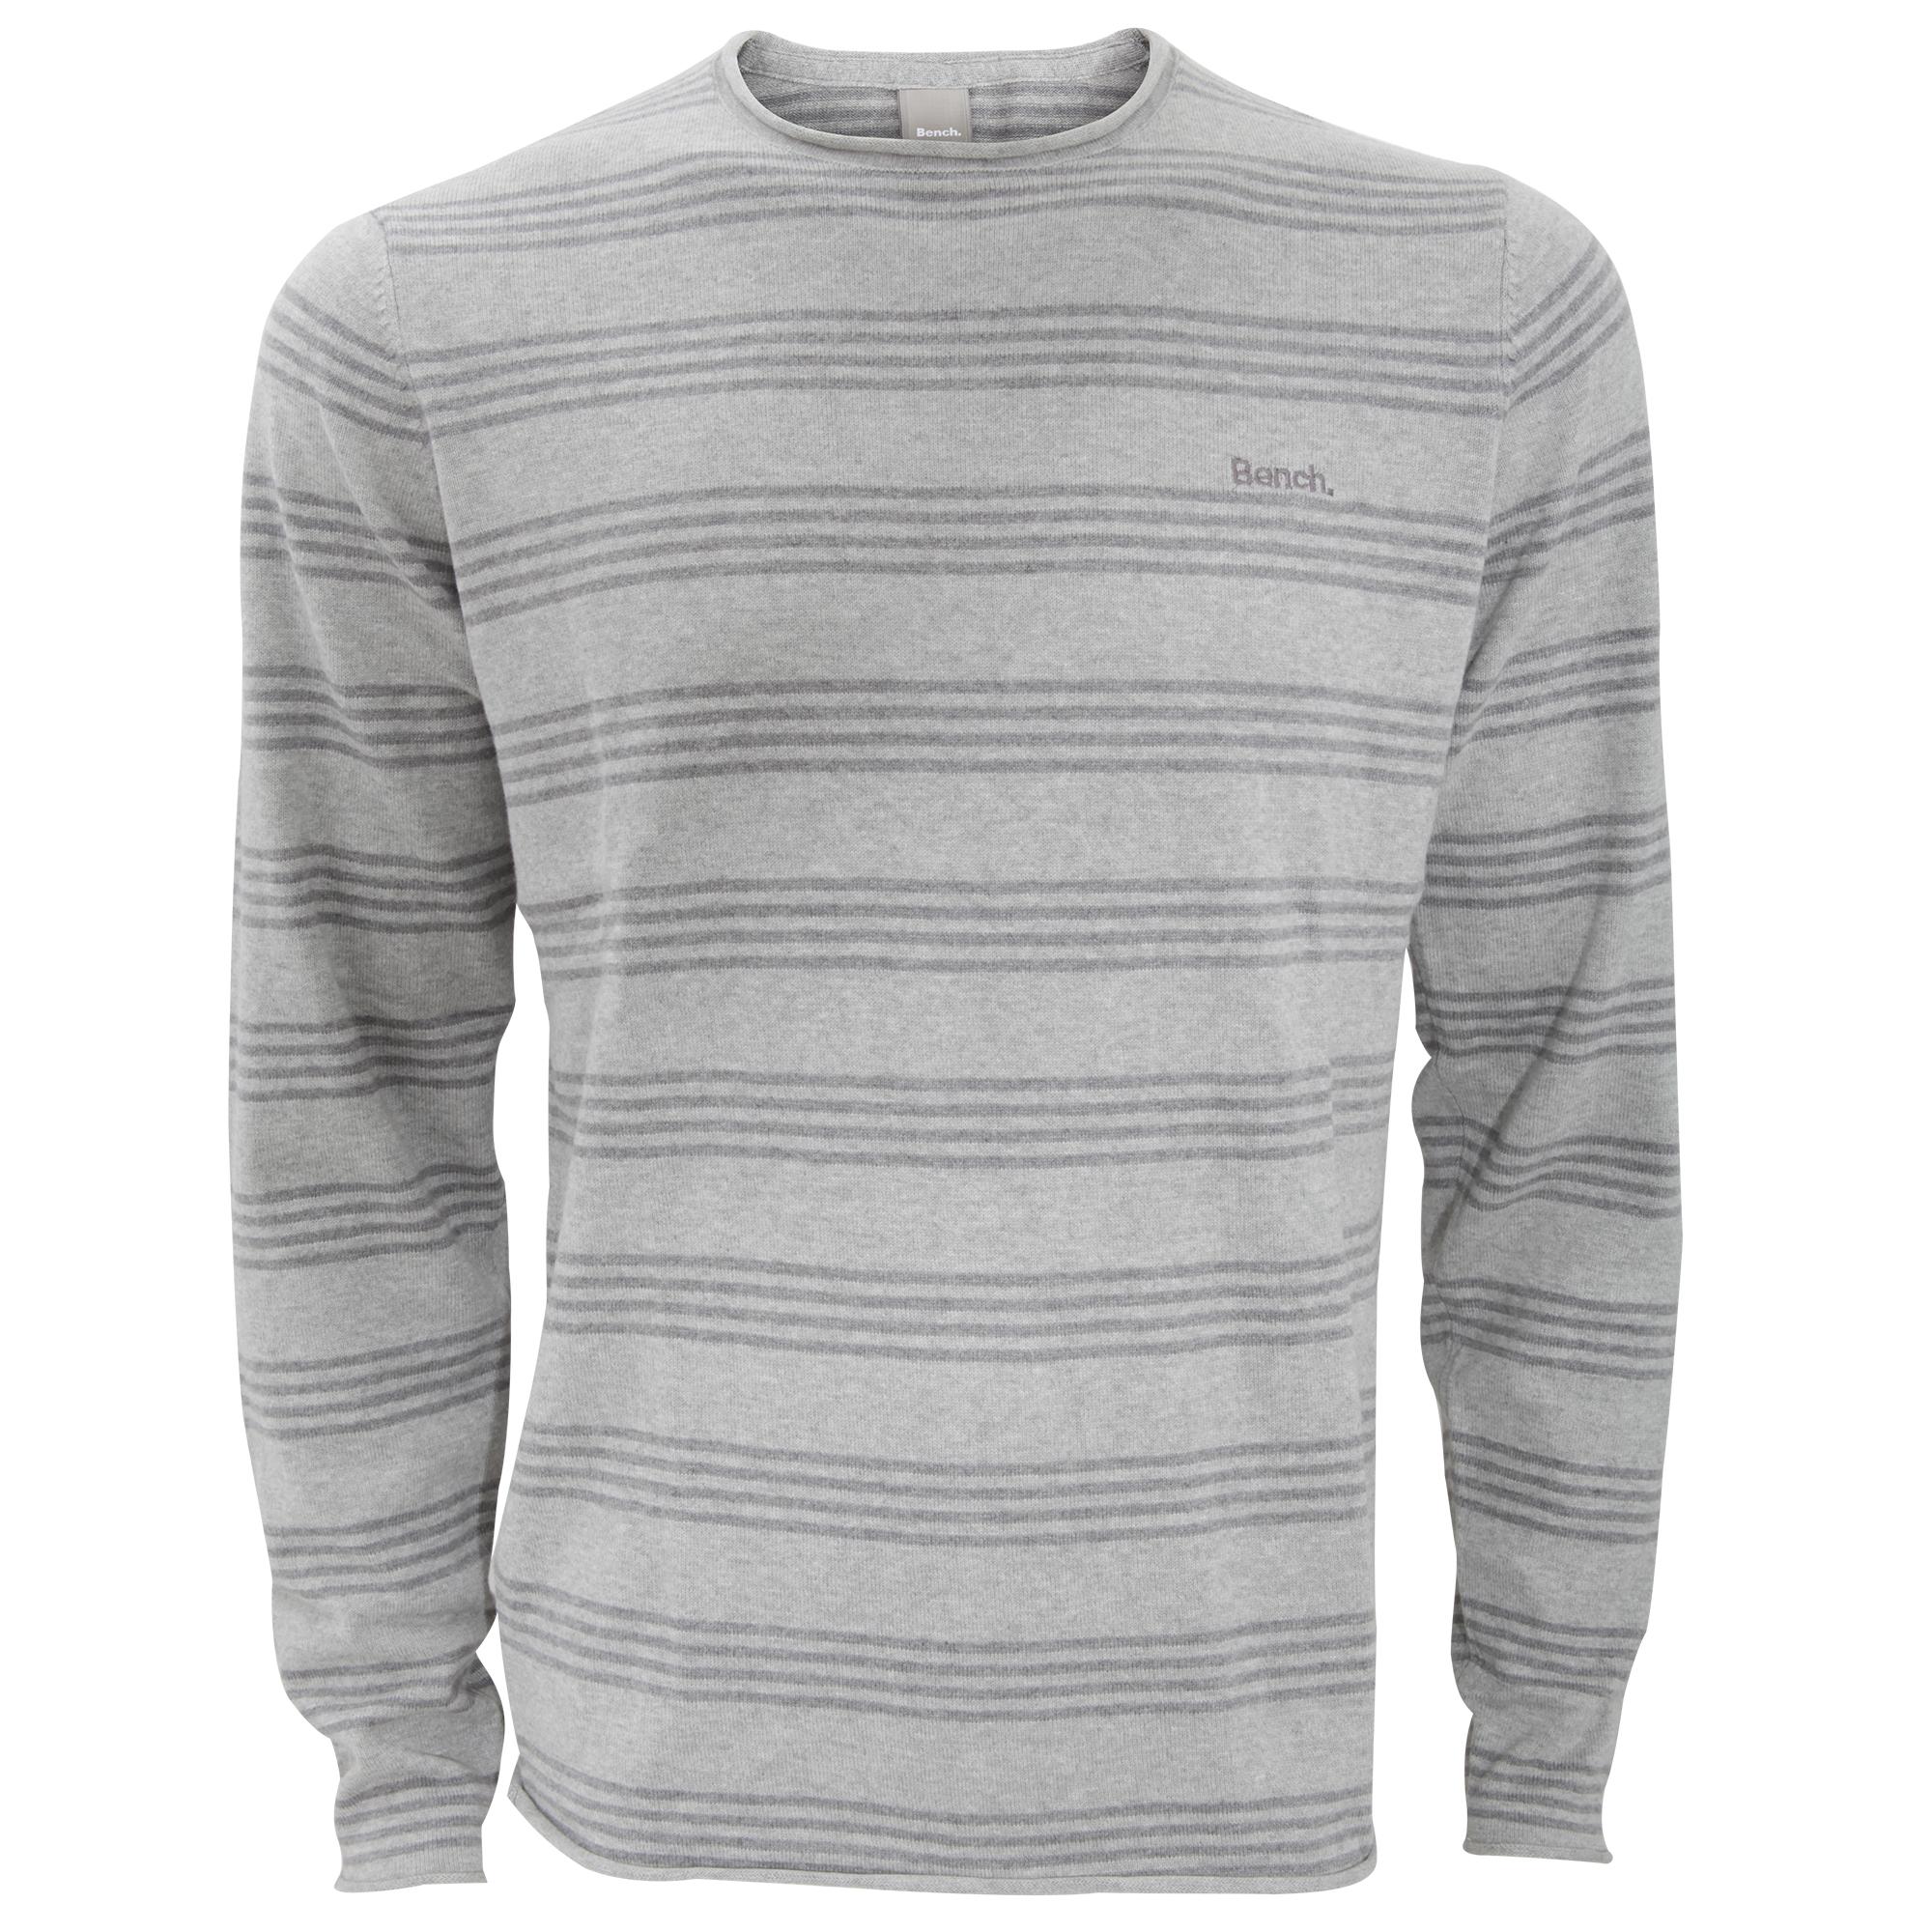 bench herren adour langarm streifen pullover sweater. Black Bedroom Furniture Sets. Home Design Ideas